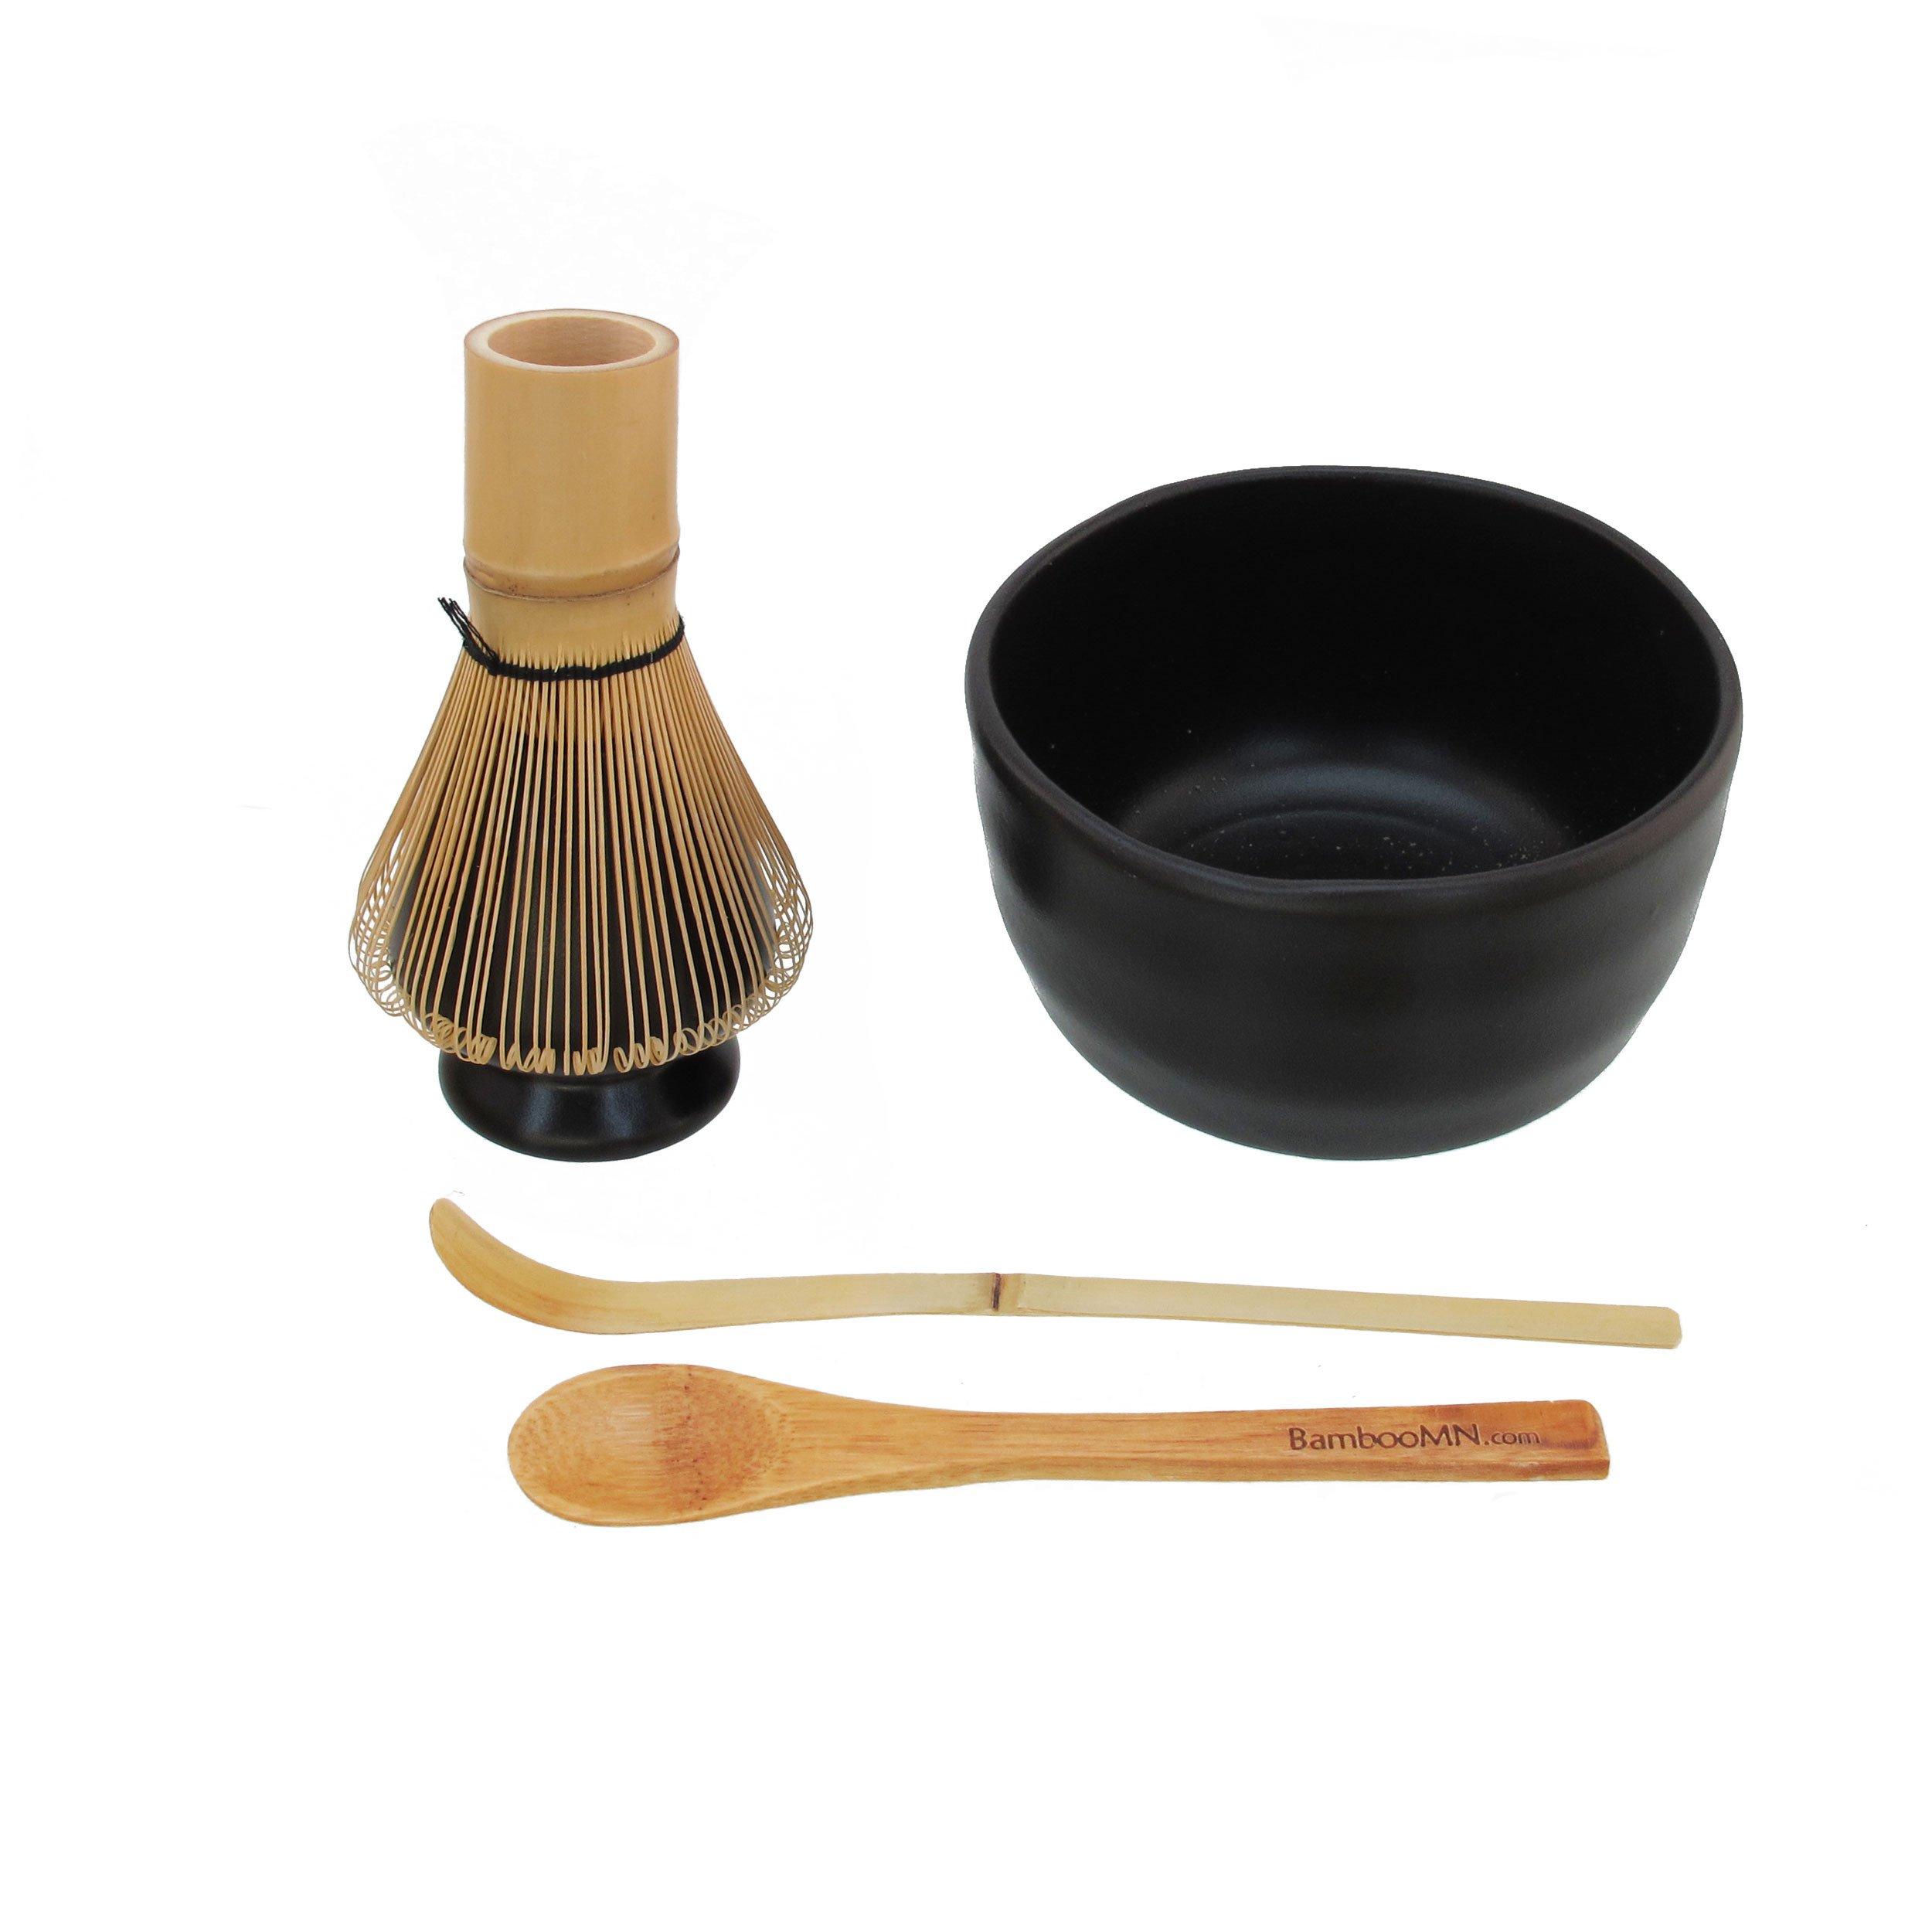 BambooMN Brand - Matcha Bowl Set (Includes Bowl, Rest,Tea Whisk, Chasaku, & Tea Spoon) 1 Set Black